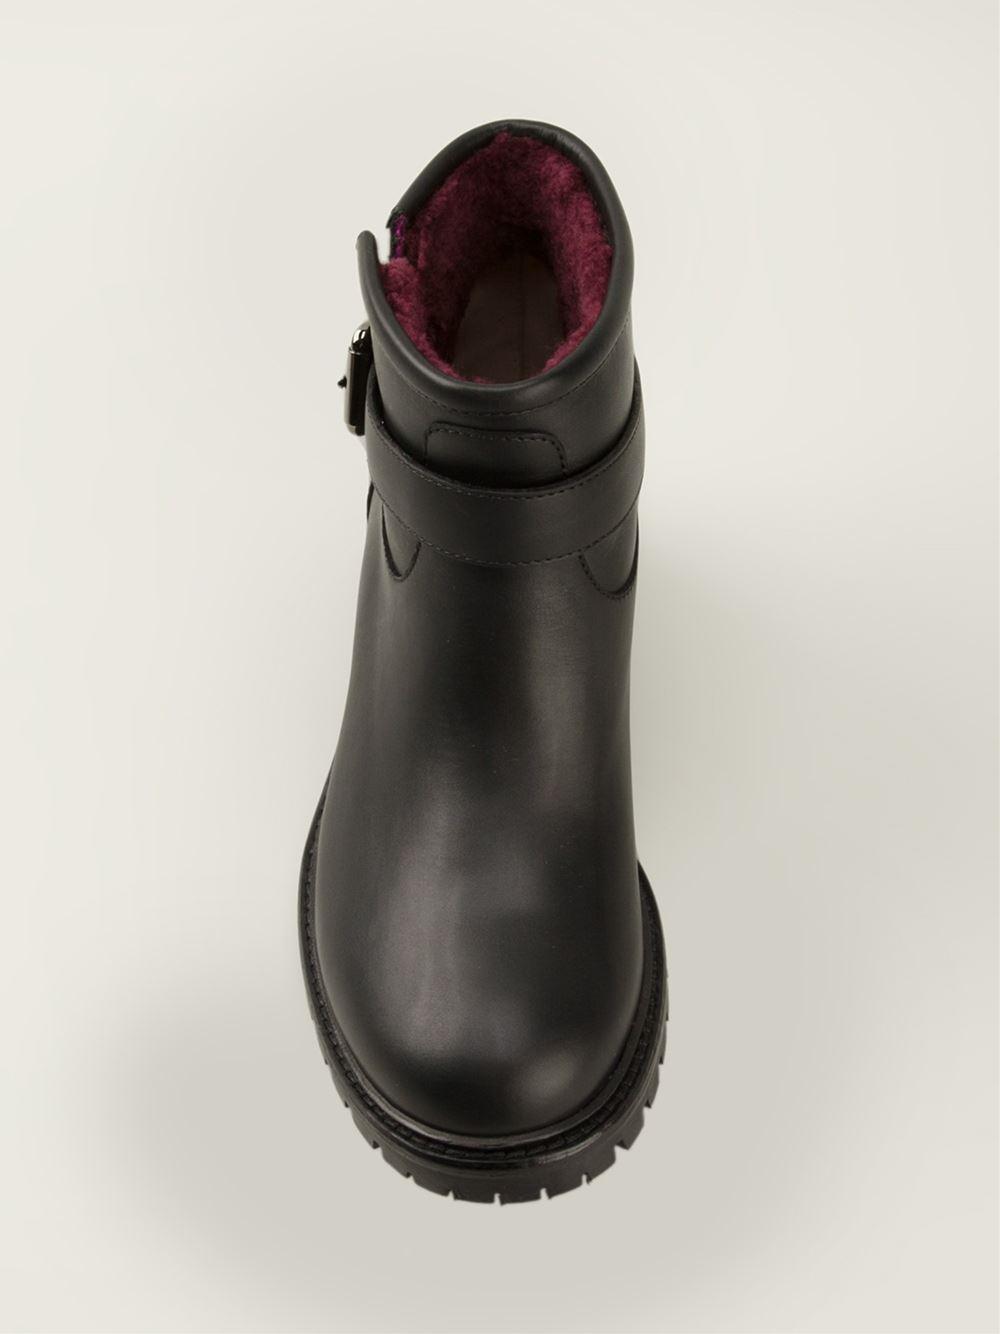 Fendi Buckled Biker Boots in Black